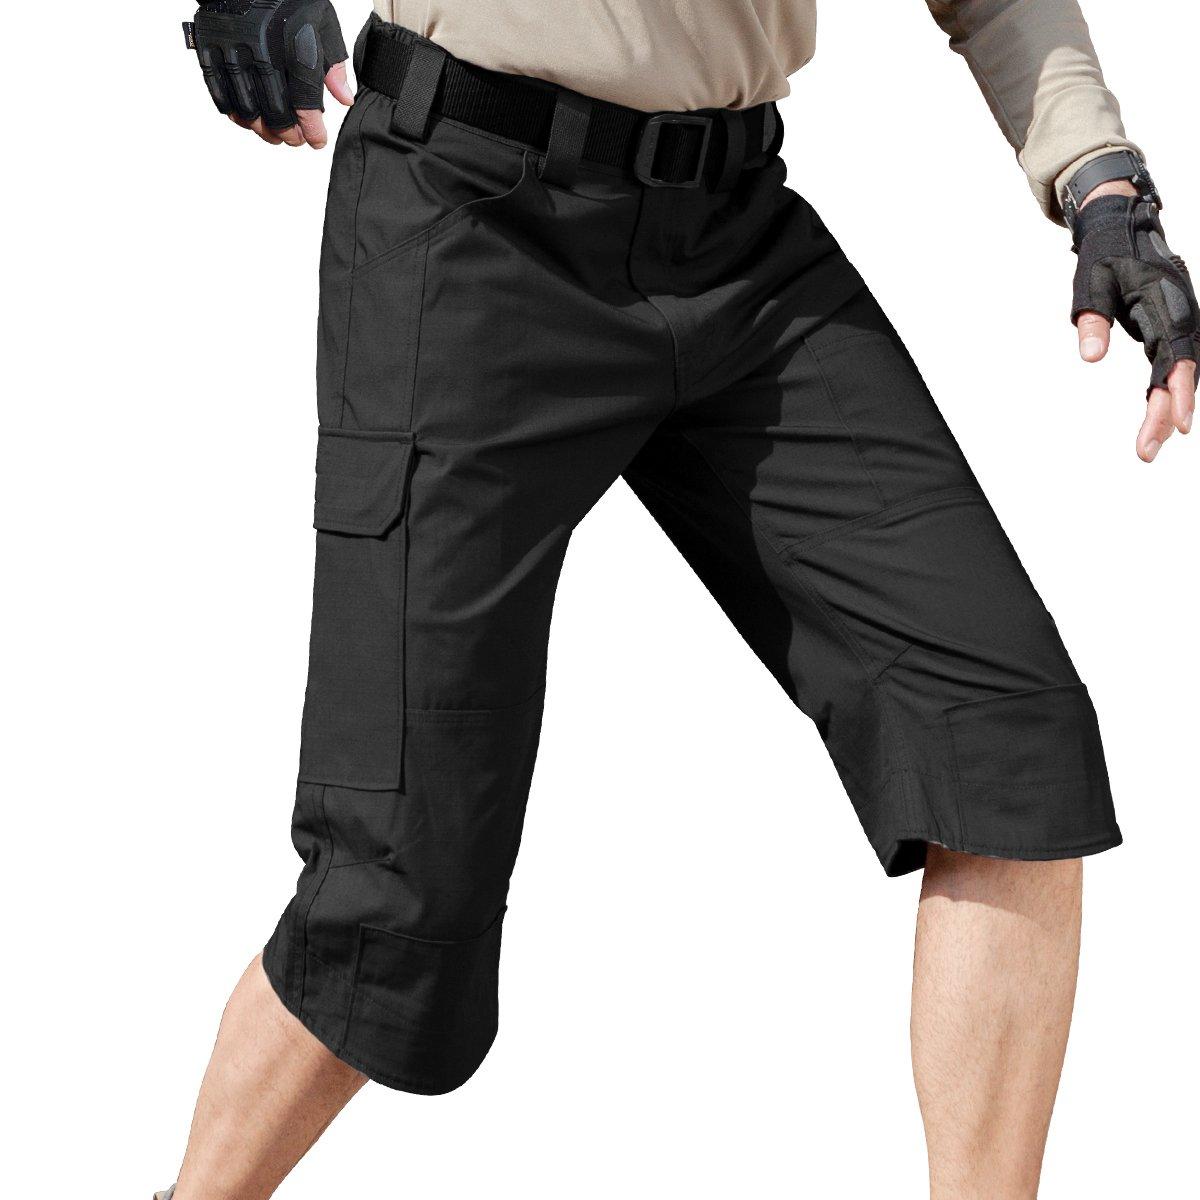 FREE SOLDIER Men's Capri Shorts Pants Casual 3/4 Water Resistant Multi Pockets Tactical Cargo Short (Black, W40)